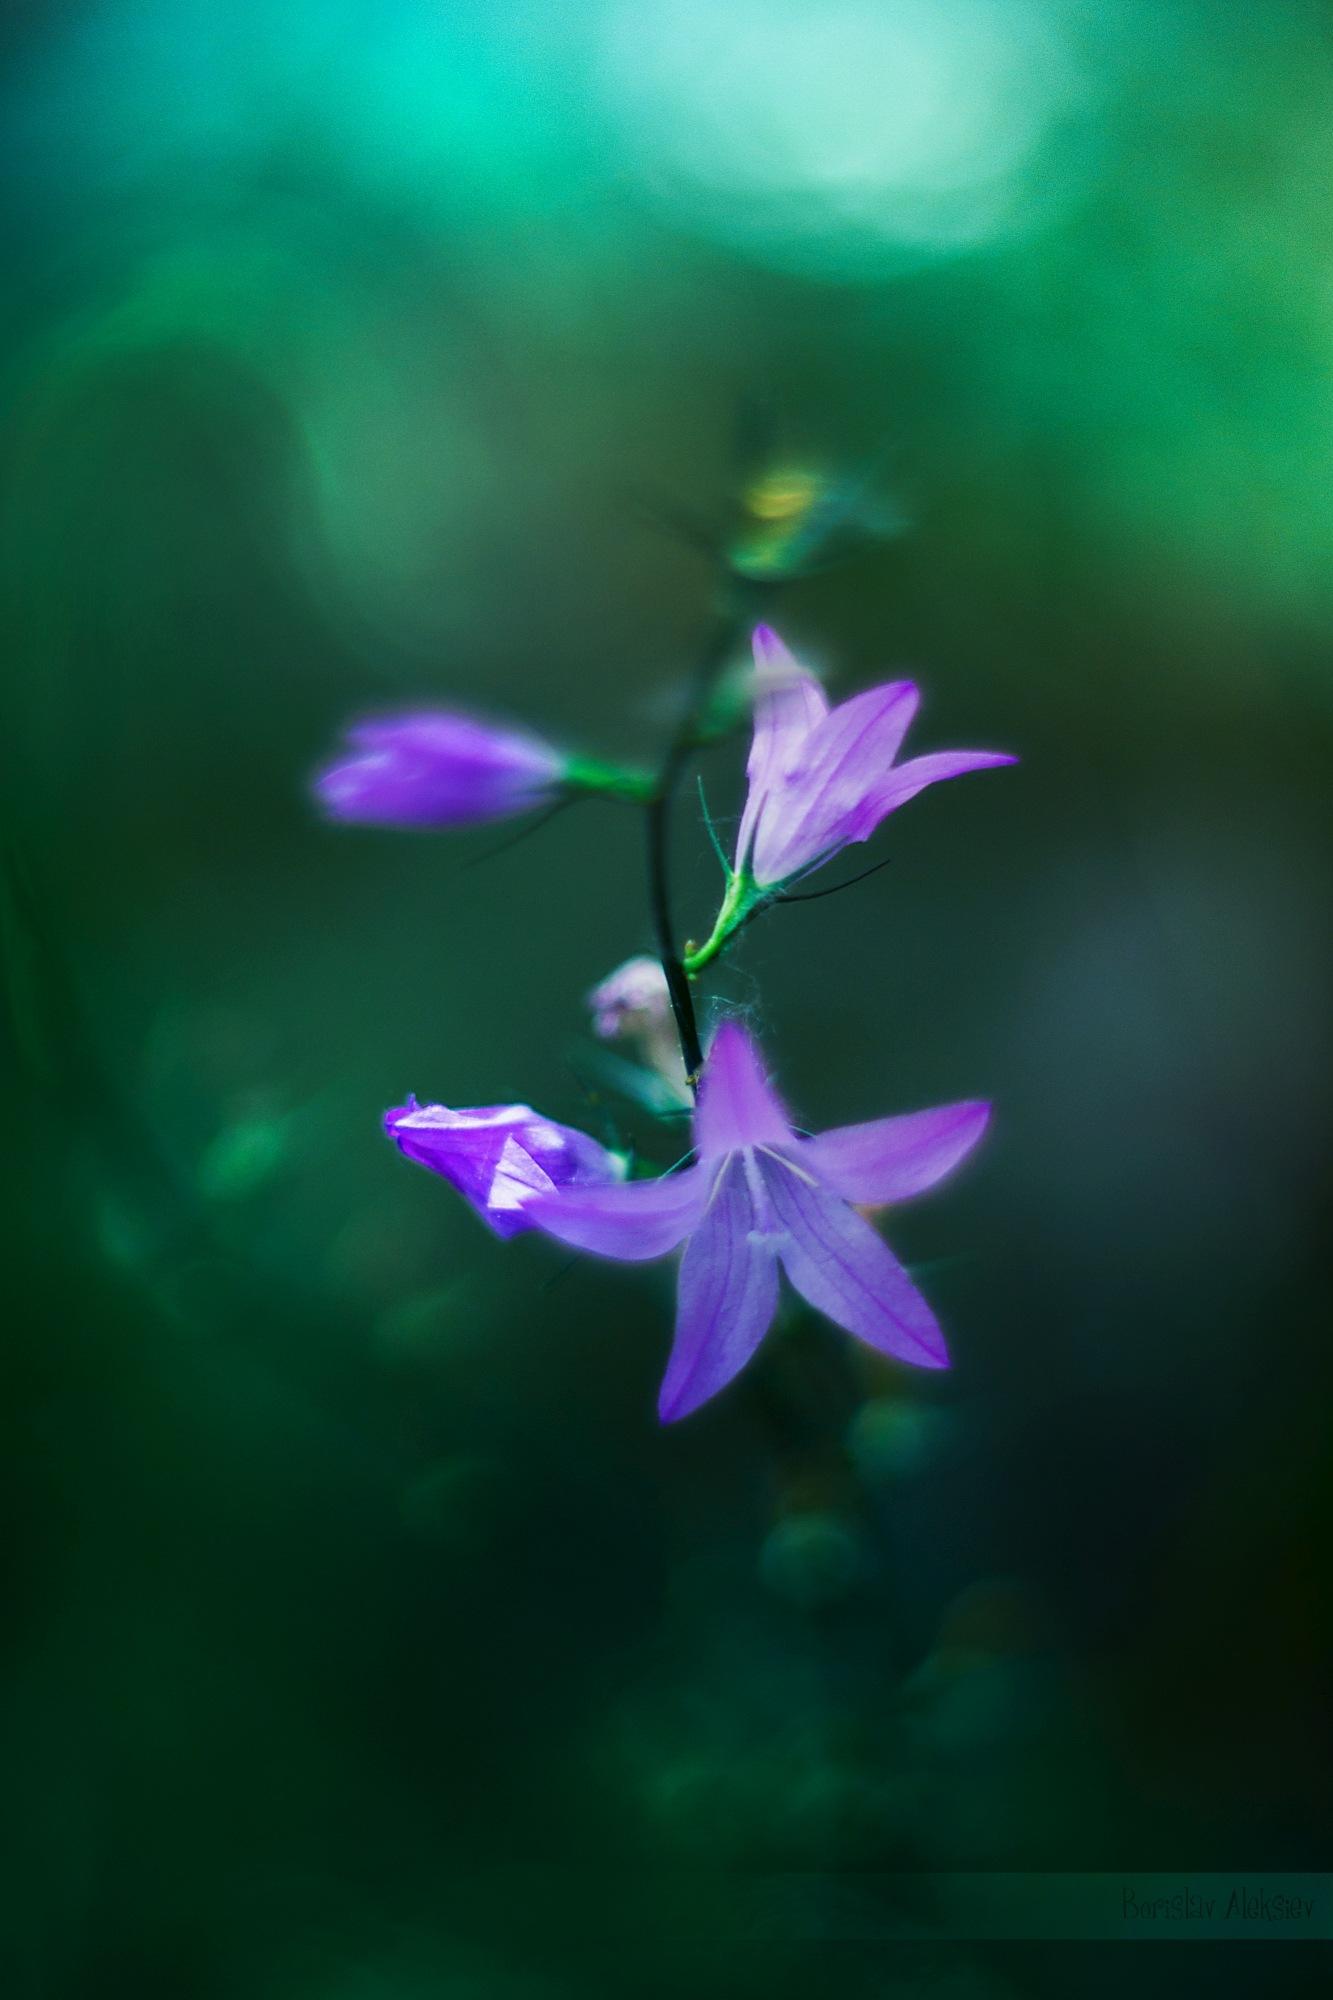 Purple and Green by Borislav Aleksiev